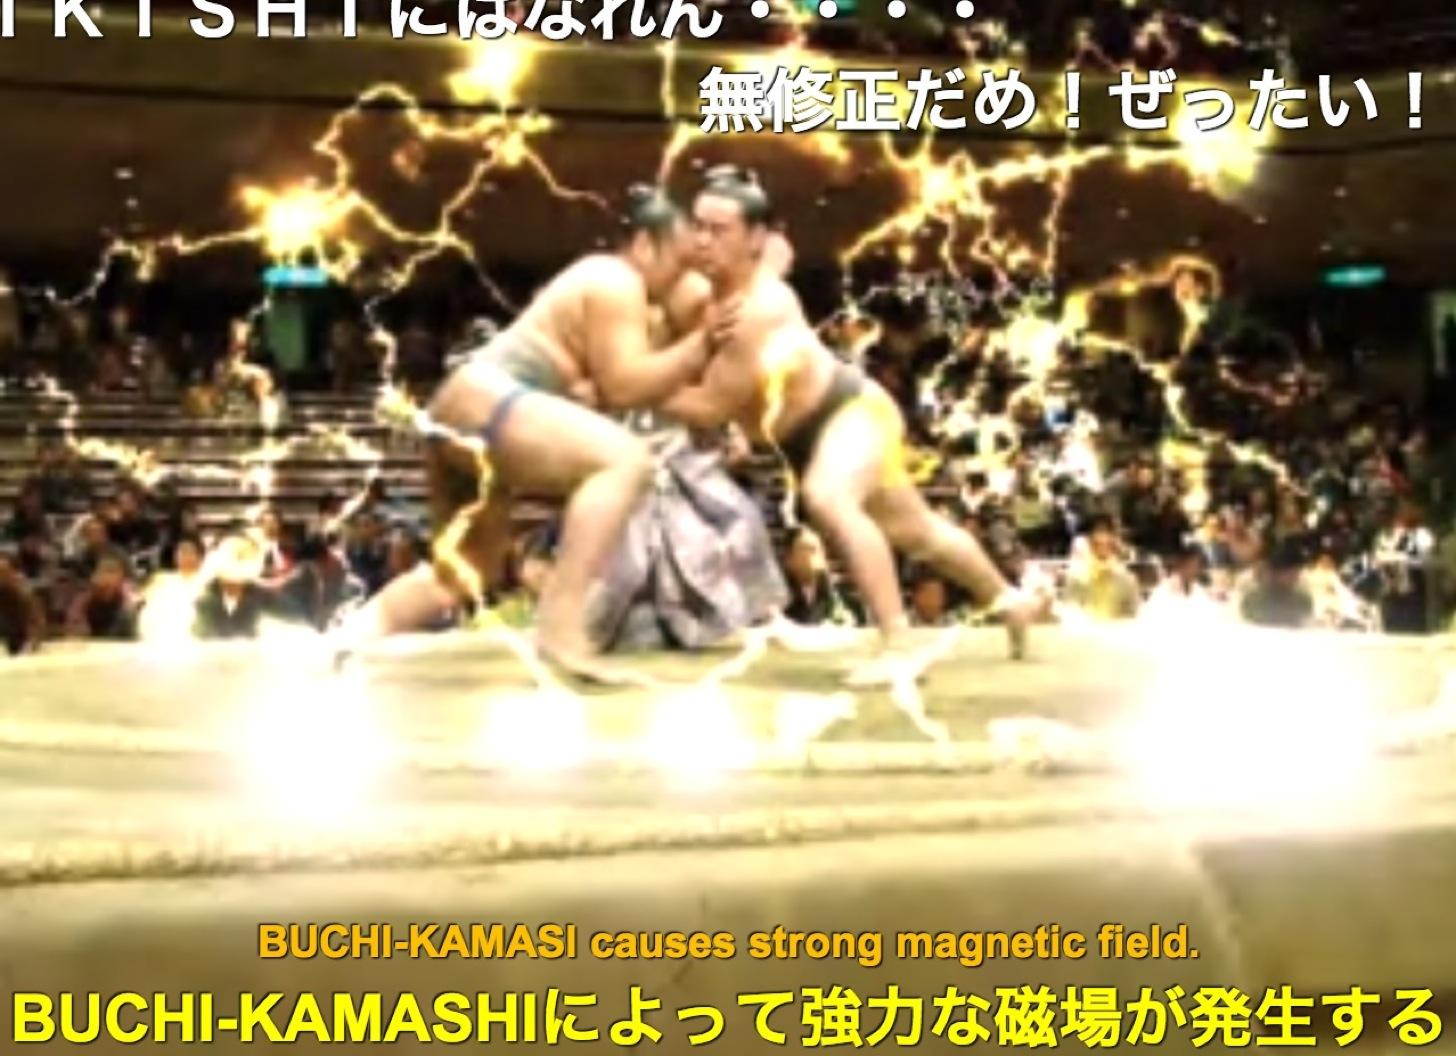 BUCHI-KAMASHIによって強力な磁場が発生する